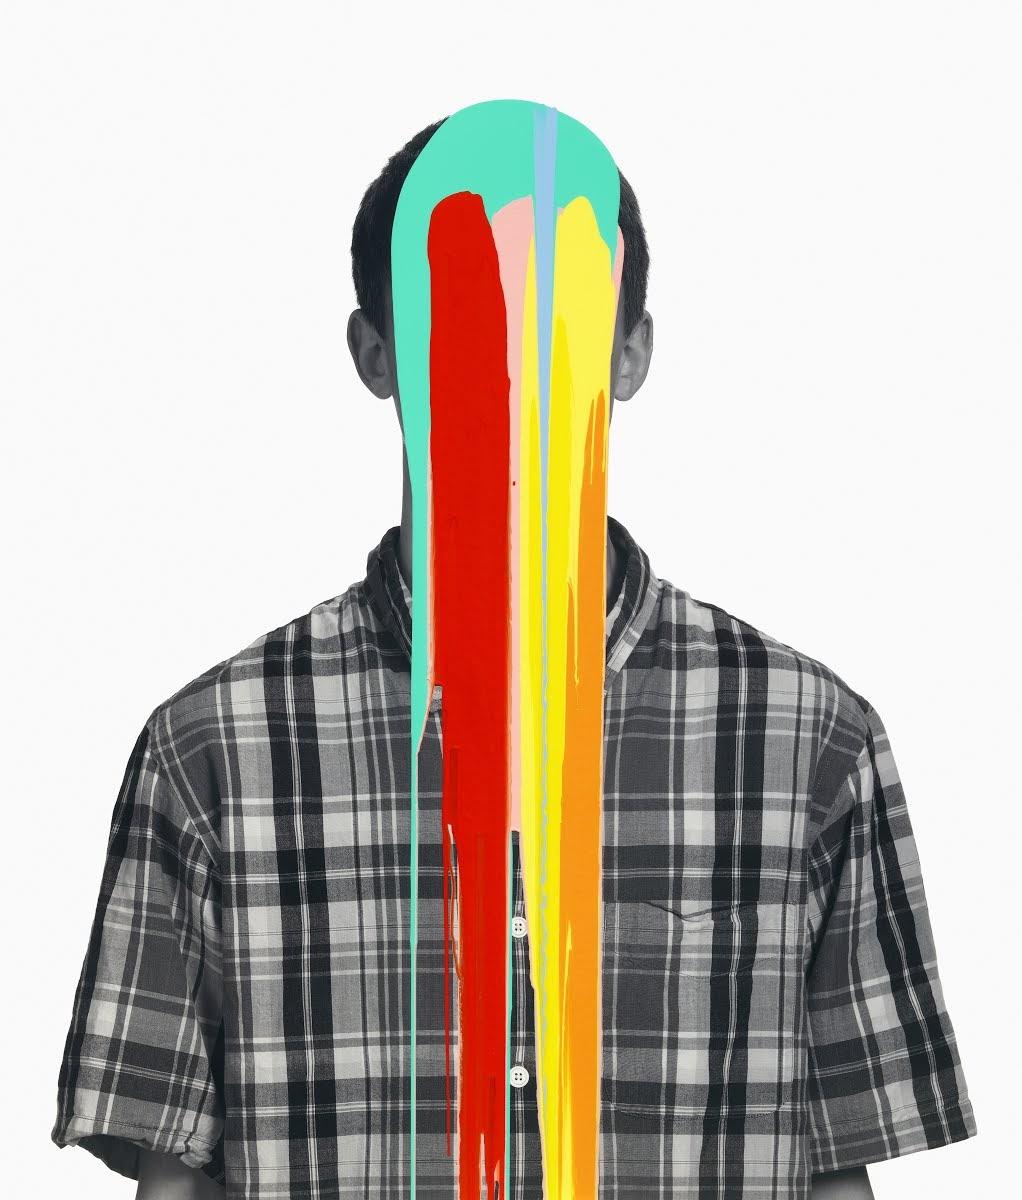 (Brilliant Information Overload Pop Head, 2010)